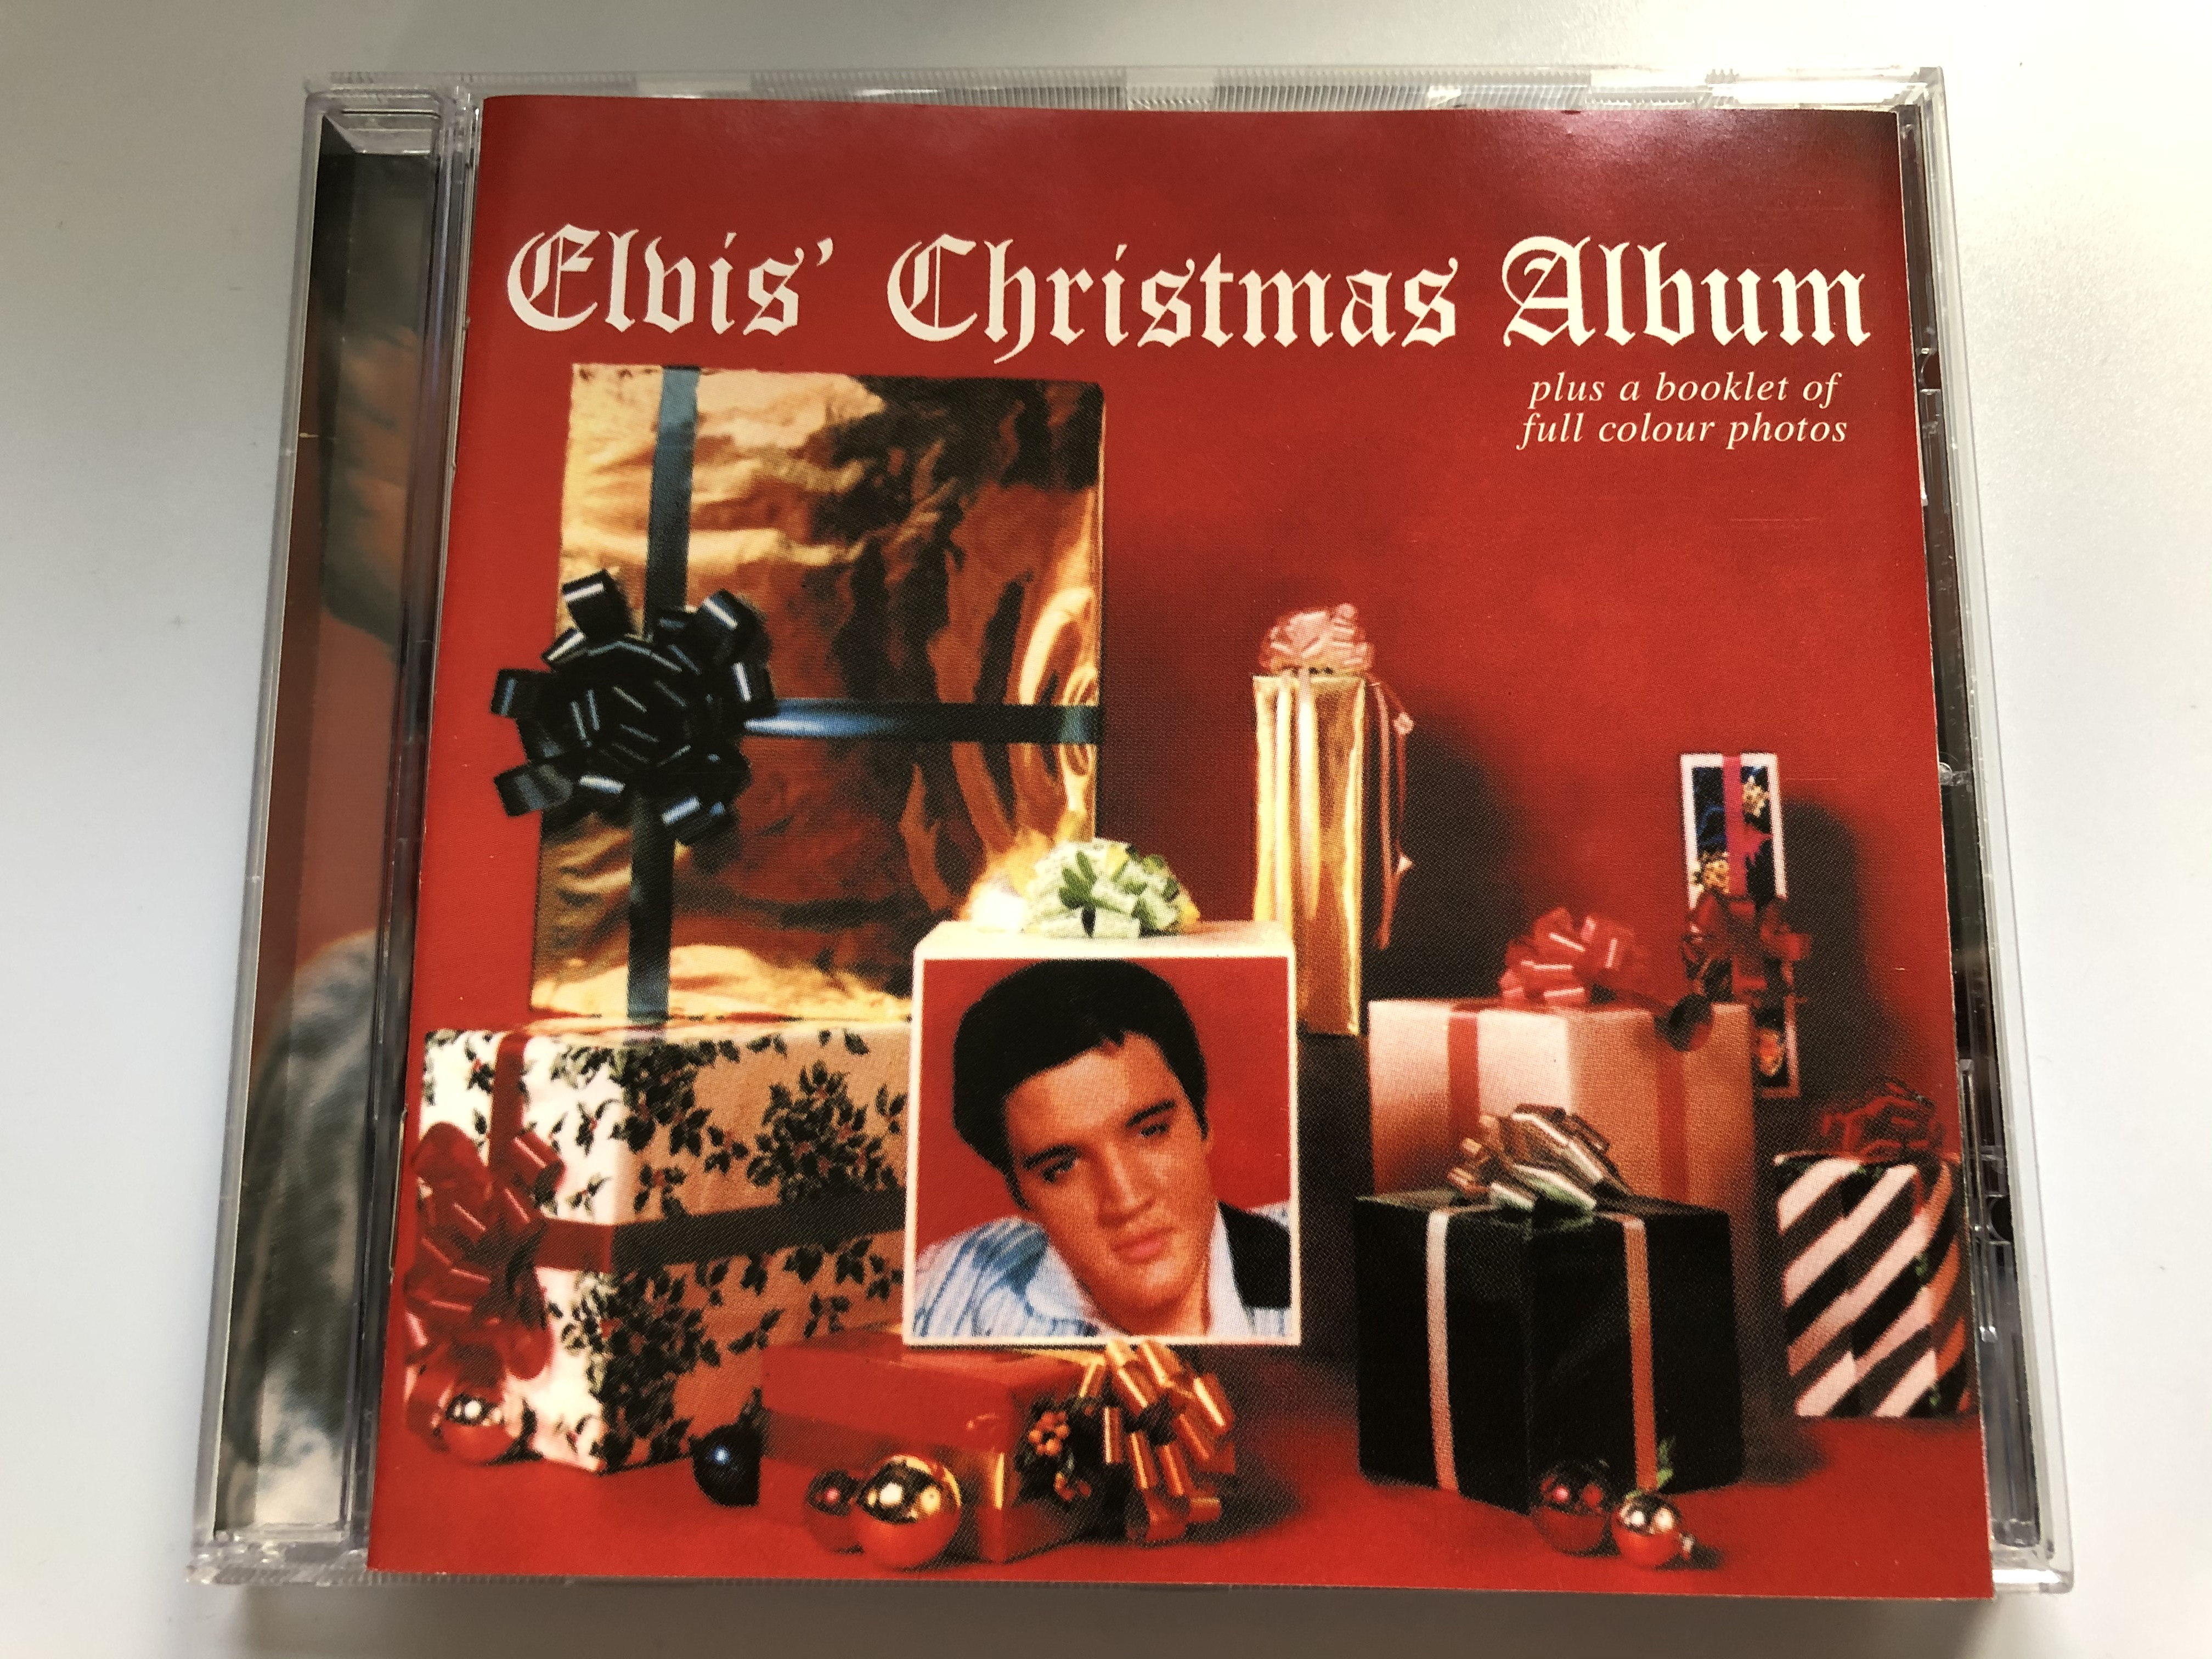 elvis-christmas-album-plus-a-booklet-of-full-colour-photos-bmg-audio-cd-1999-74321-695762-1-.jpg